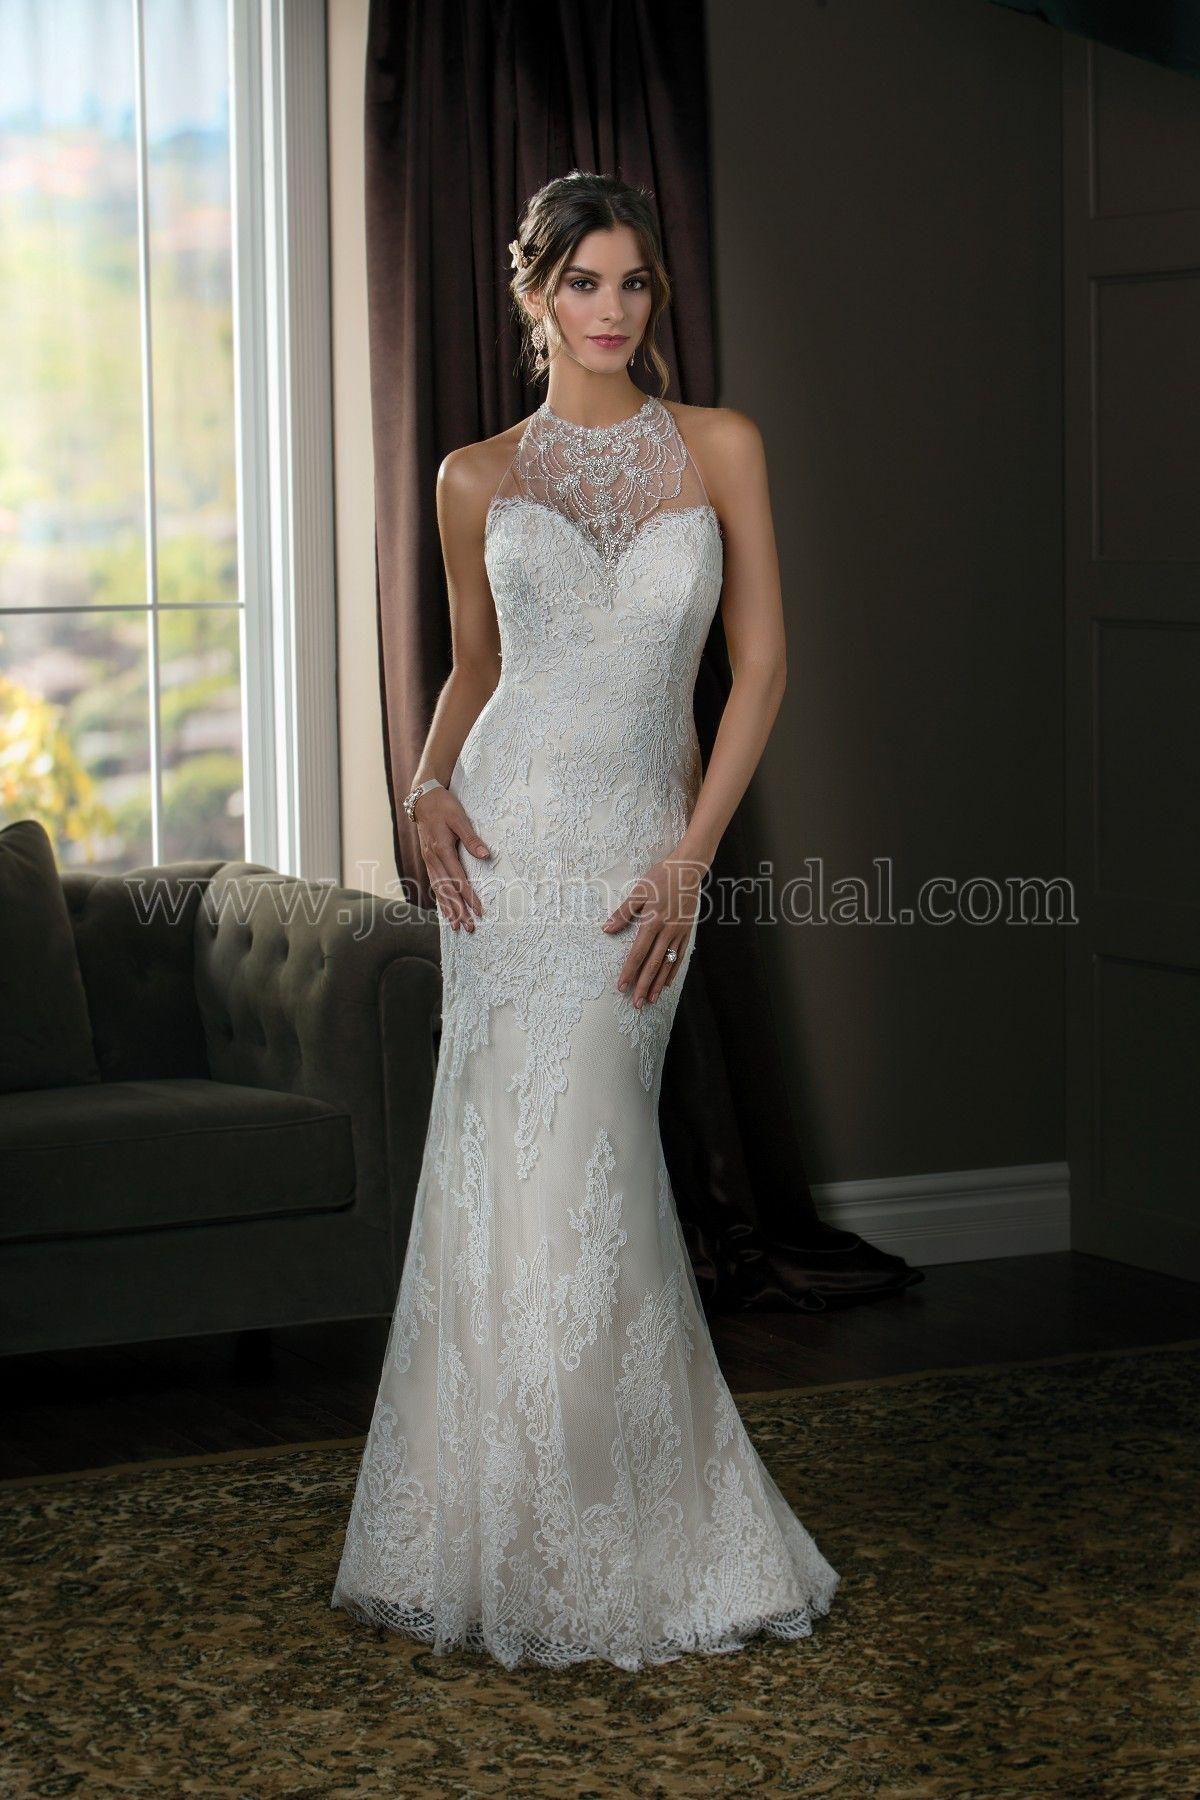 JASMINE BRIDAL Bridal Dresses UkWedding